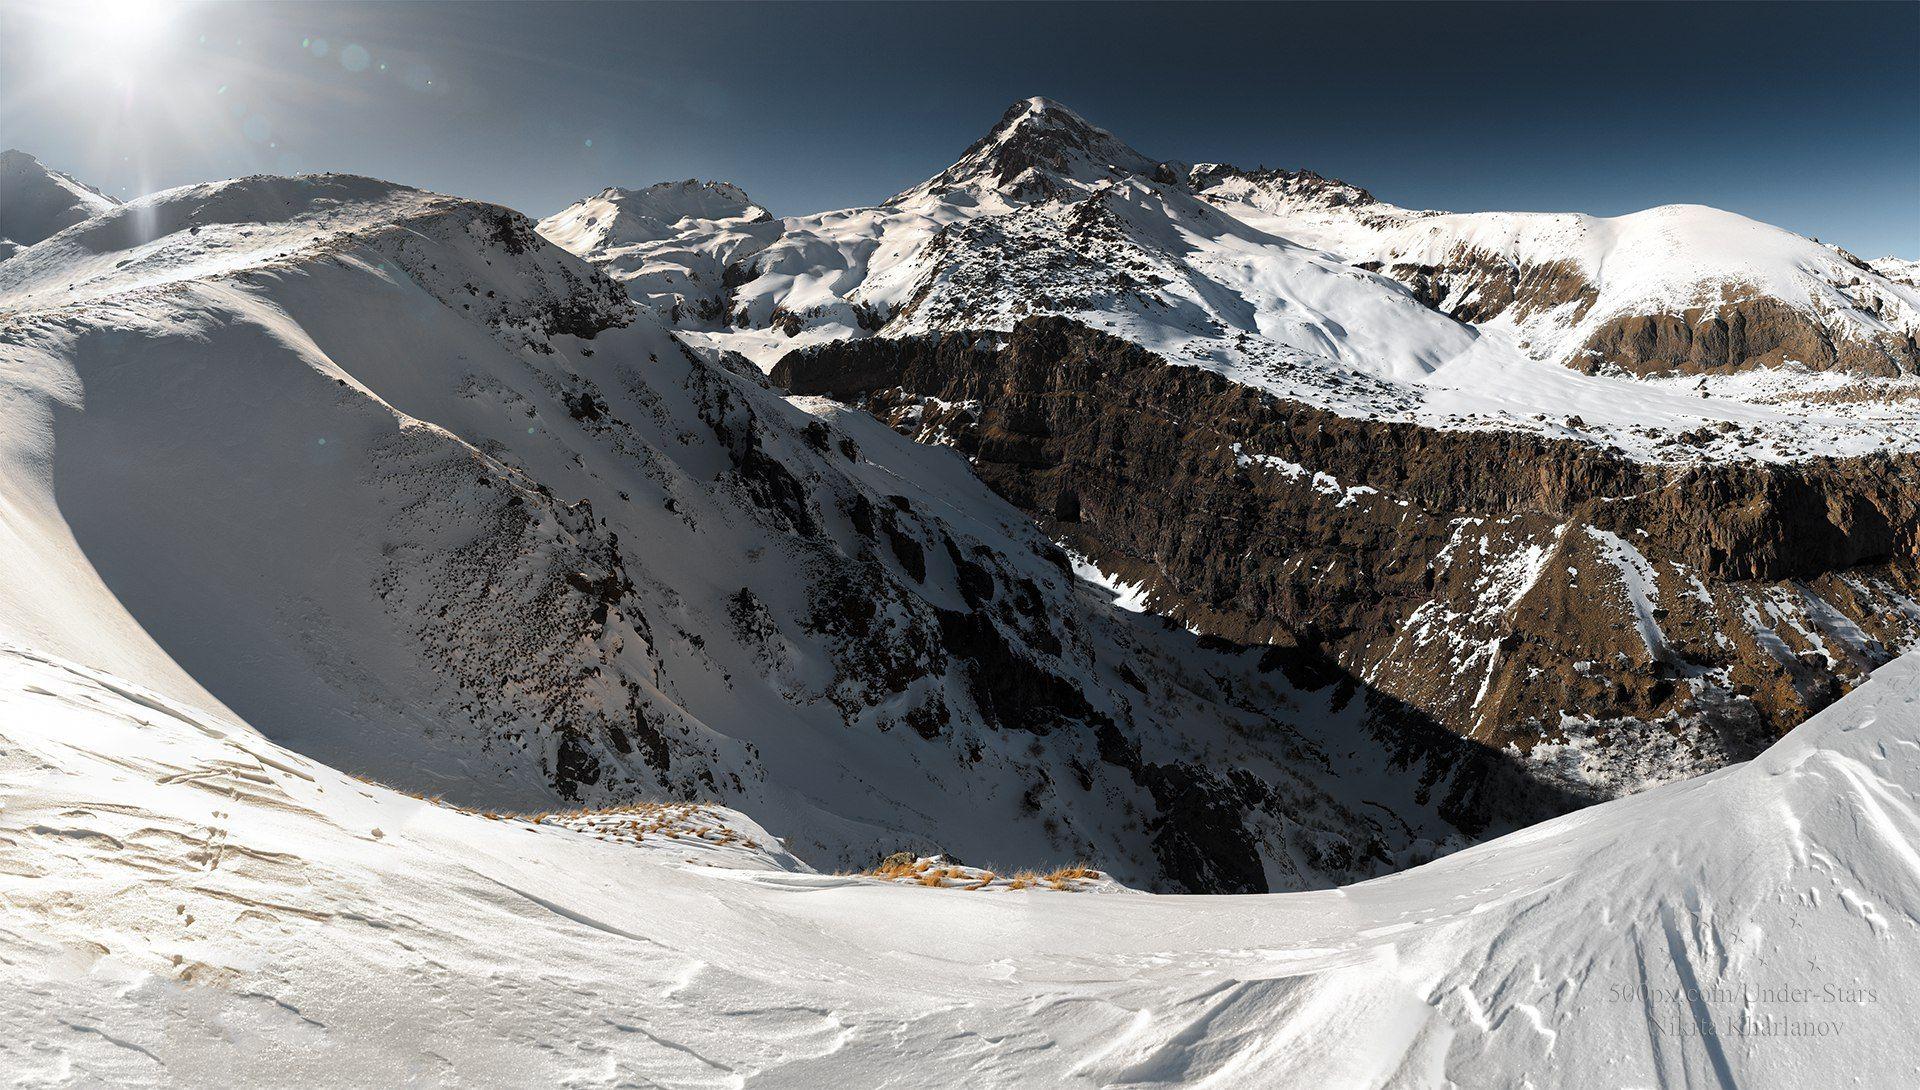 казбек, кавказ, грузия, горы, гора. зима, снег, Харланов Никита